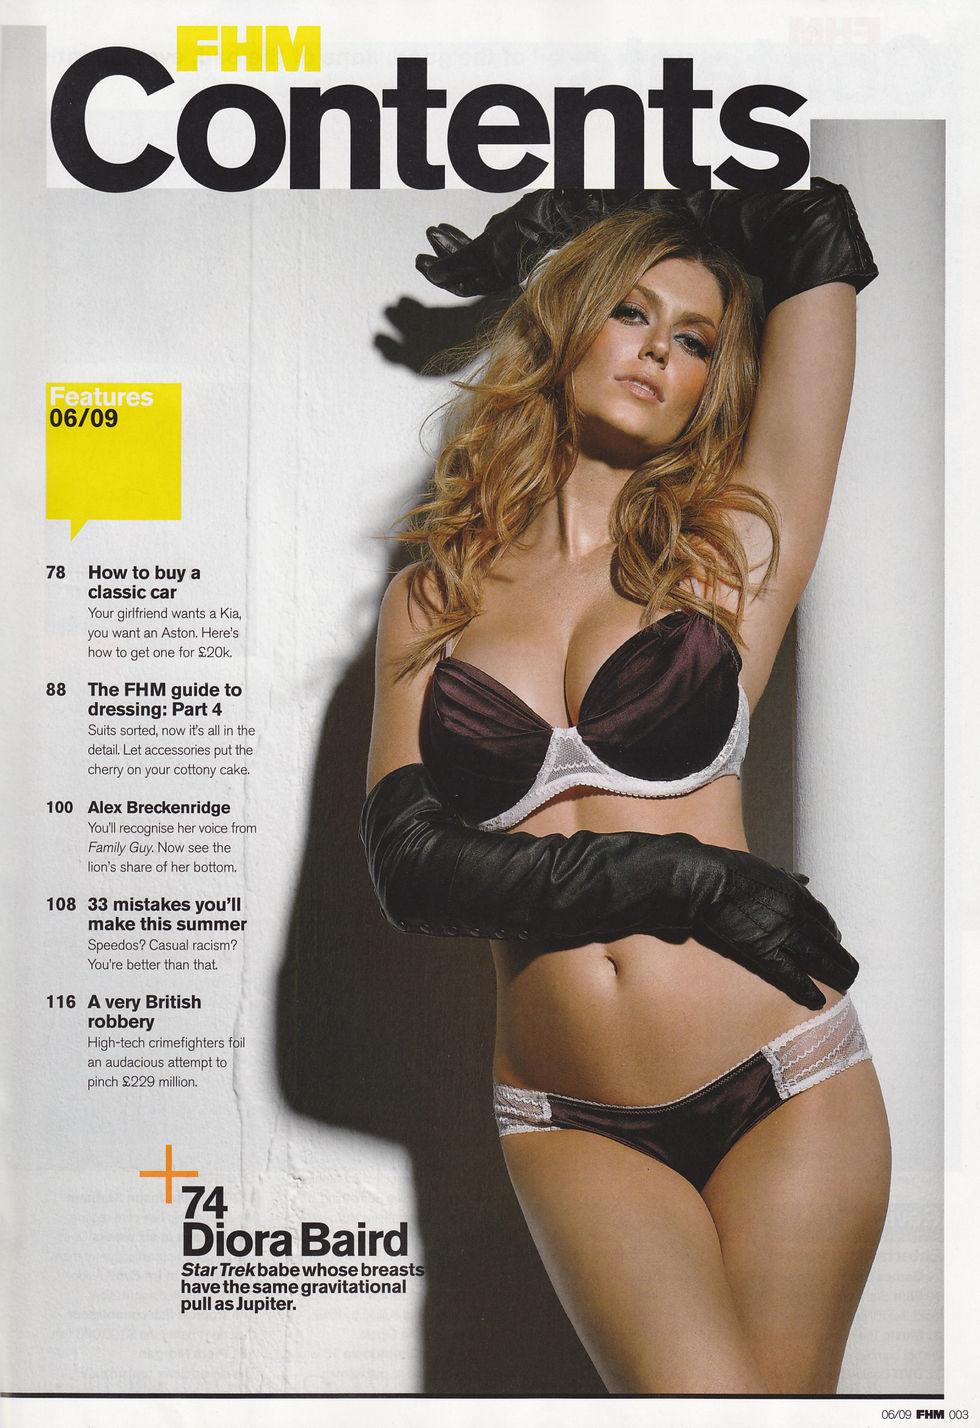 diora-baird-fhm-magazine-june-2009-01